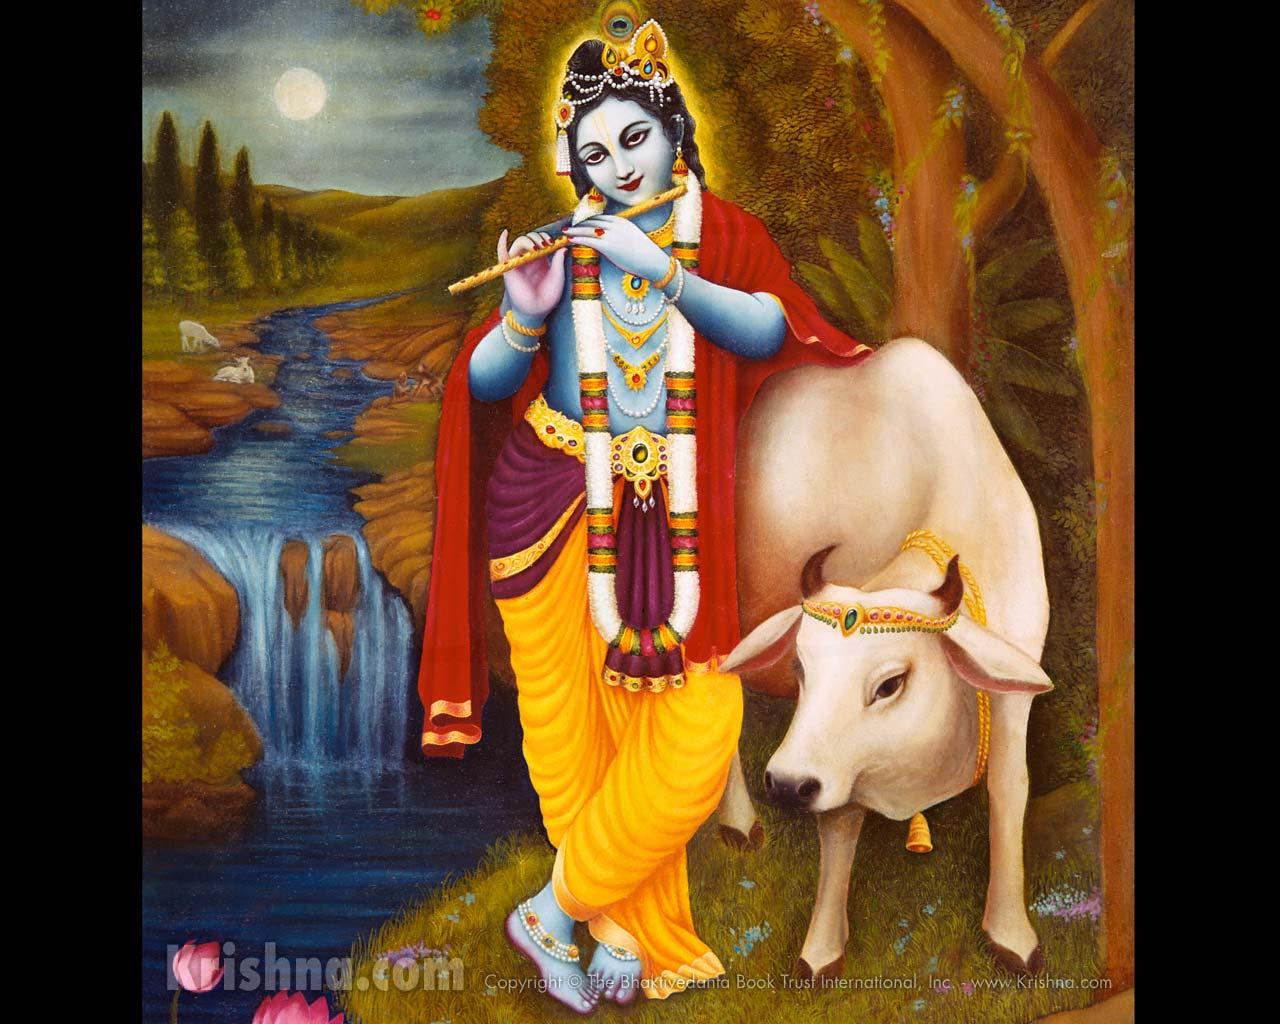 http://4.bp.blogspot.com/_OCu_uIvUaLs/S9x0ysBLmhI/AAAAAAAAA-E/ob4Rq5gE4aI/s1600/gopal-krishna1.jpg